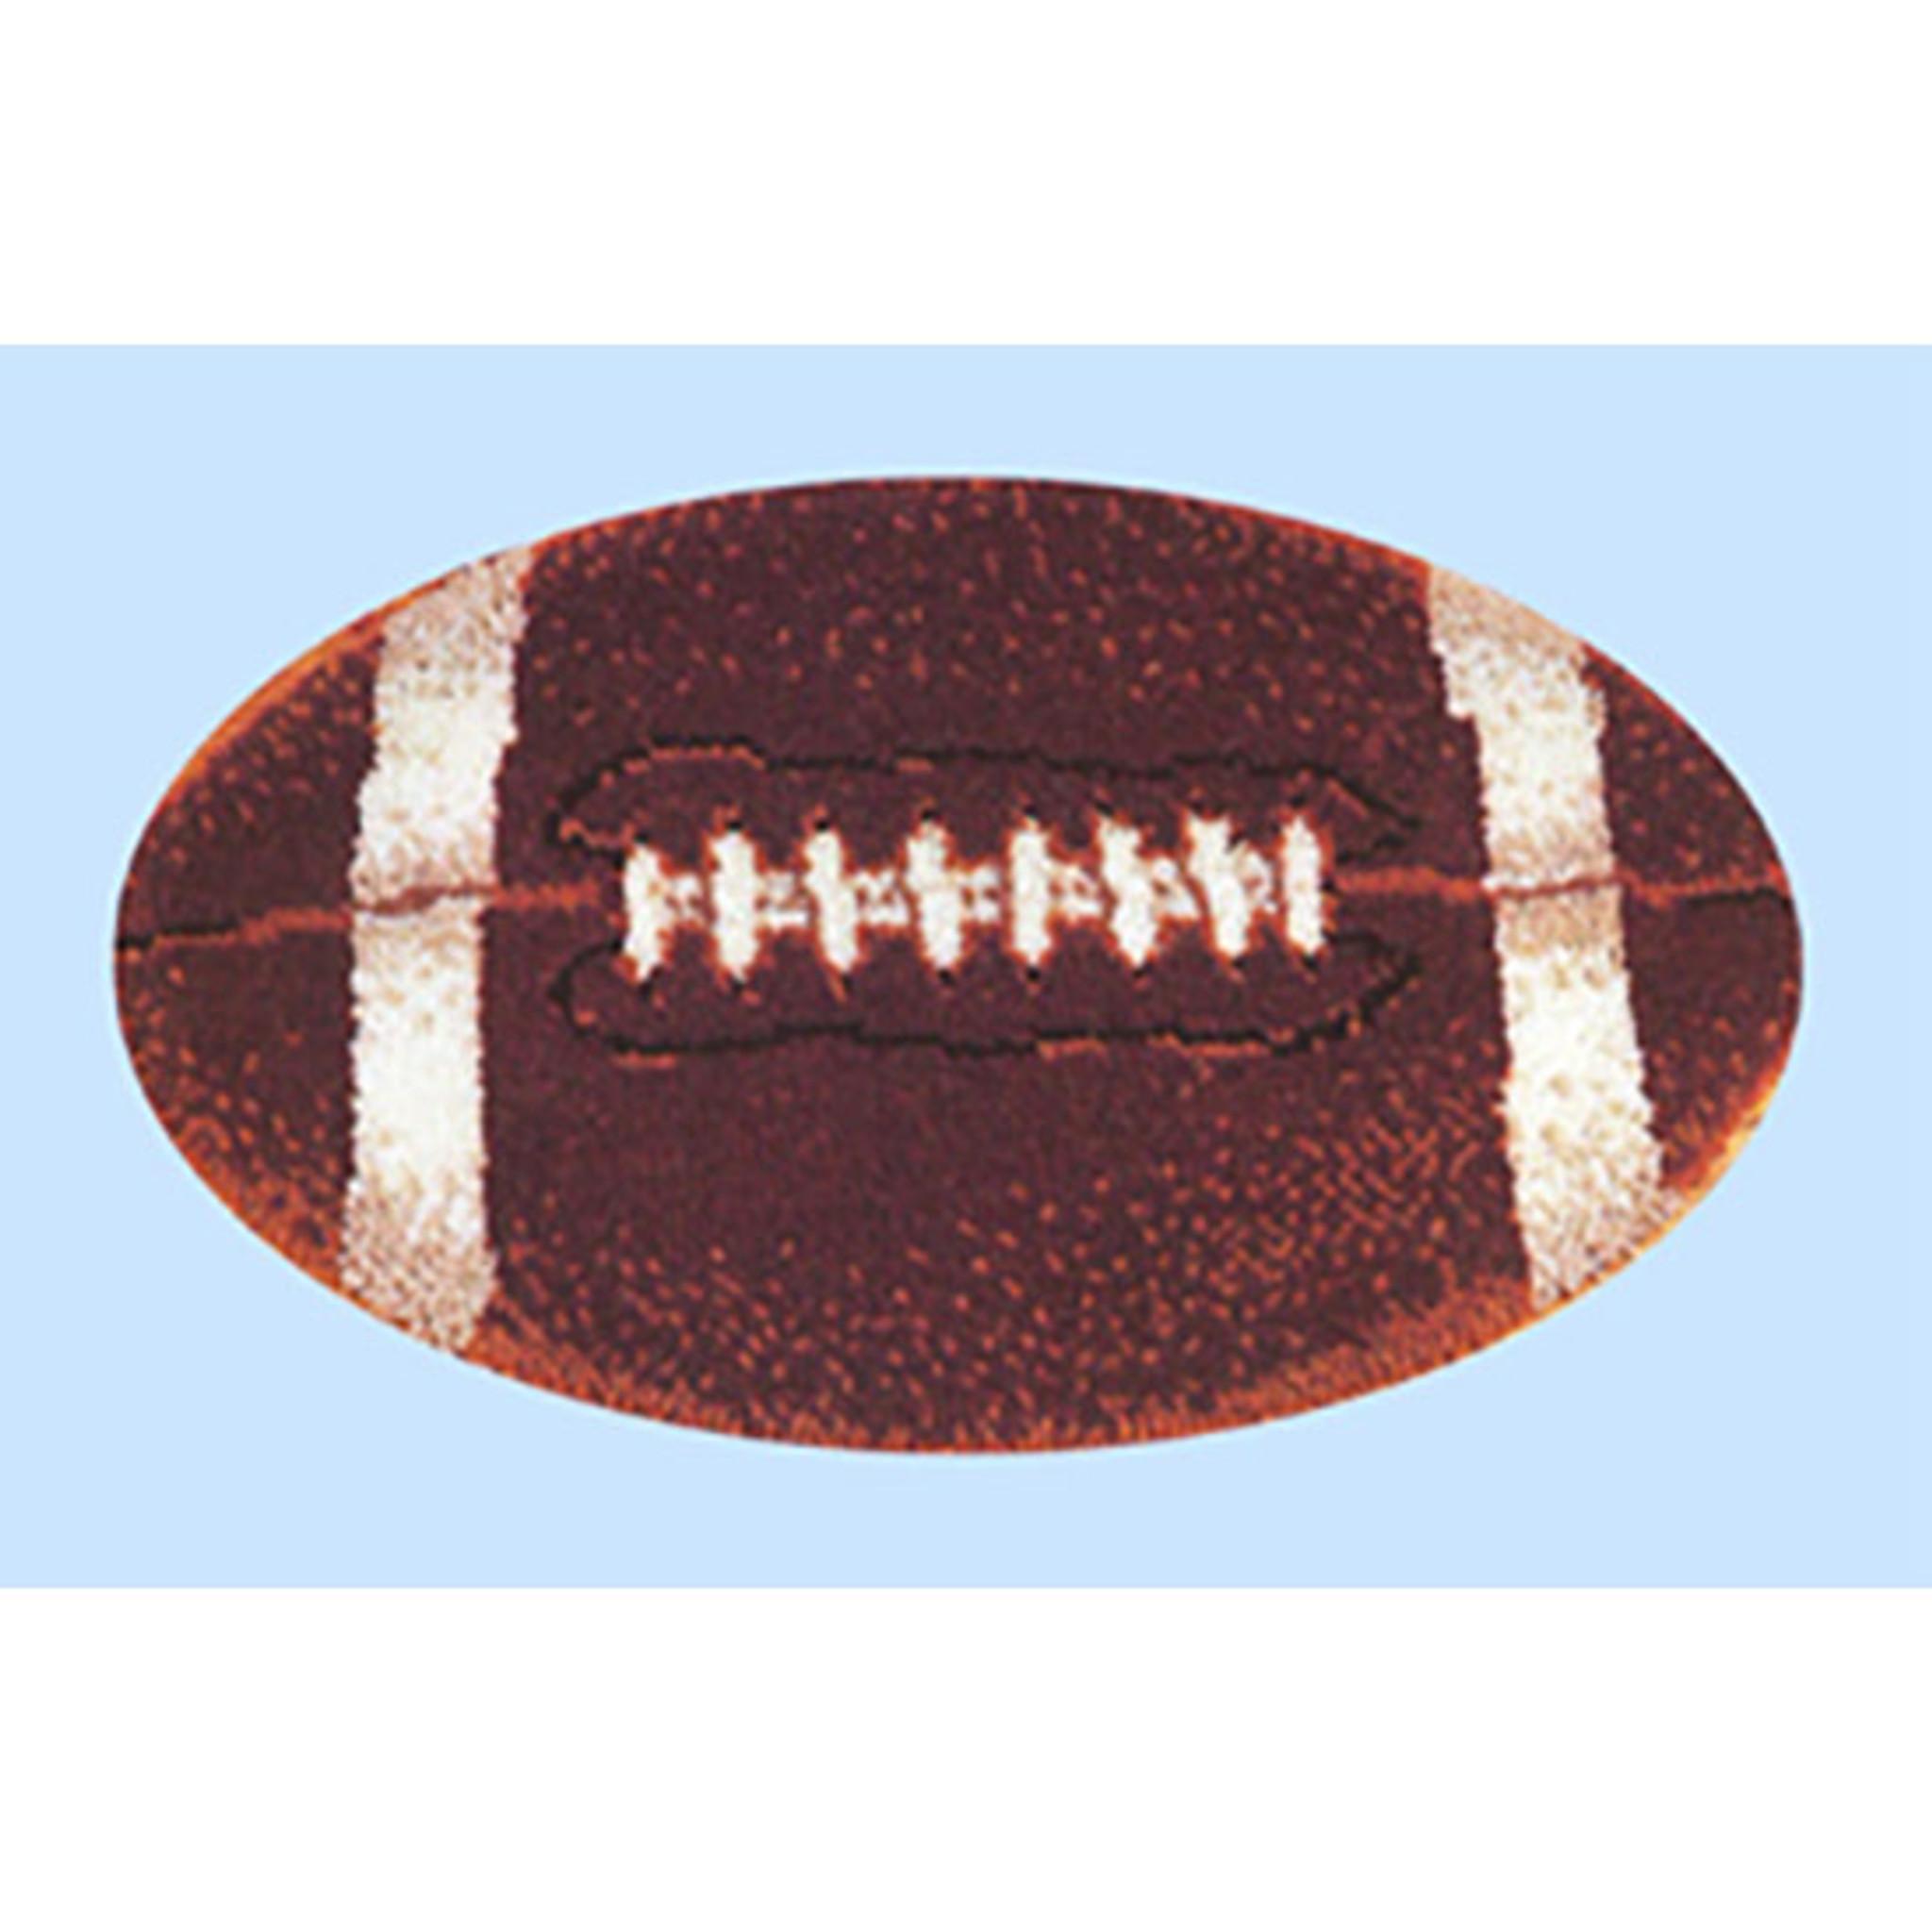 Football Latch Hook Rug Kit